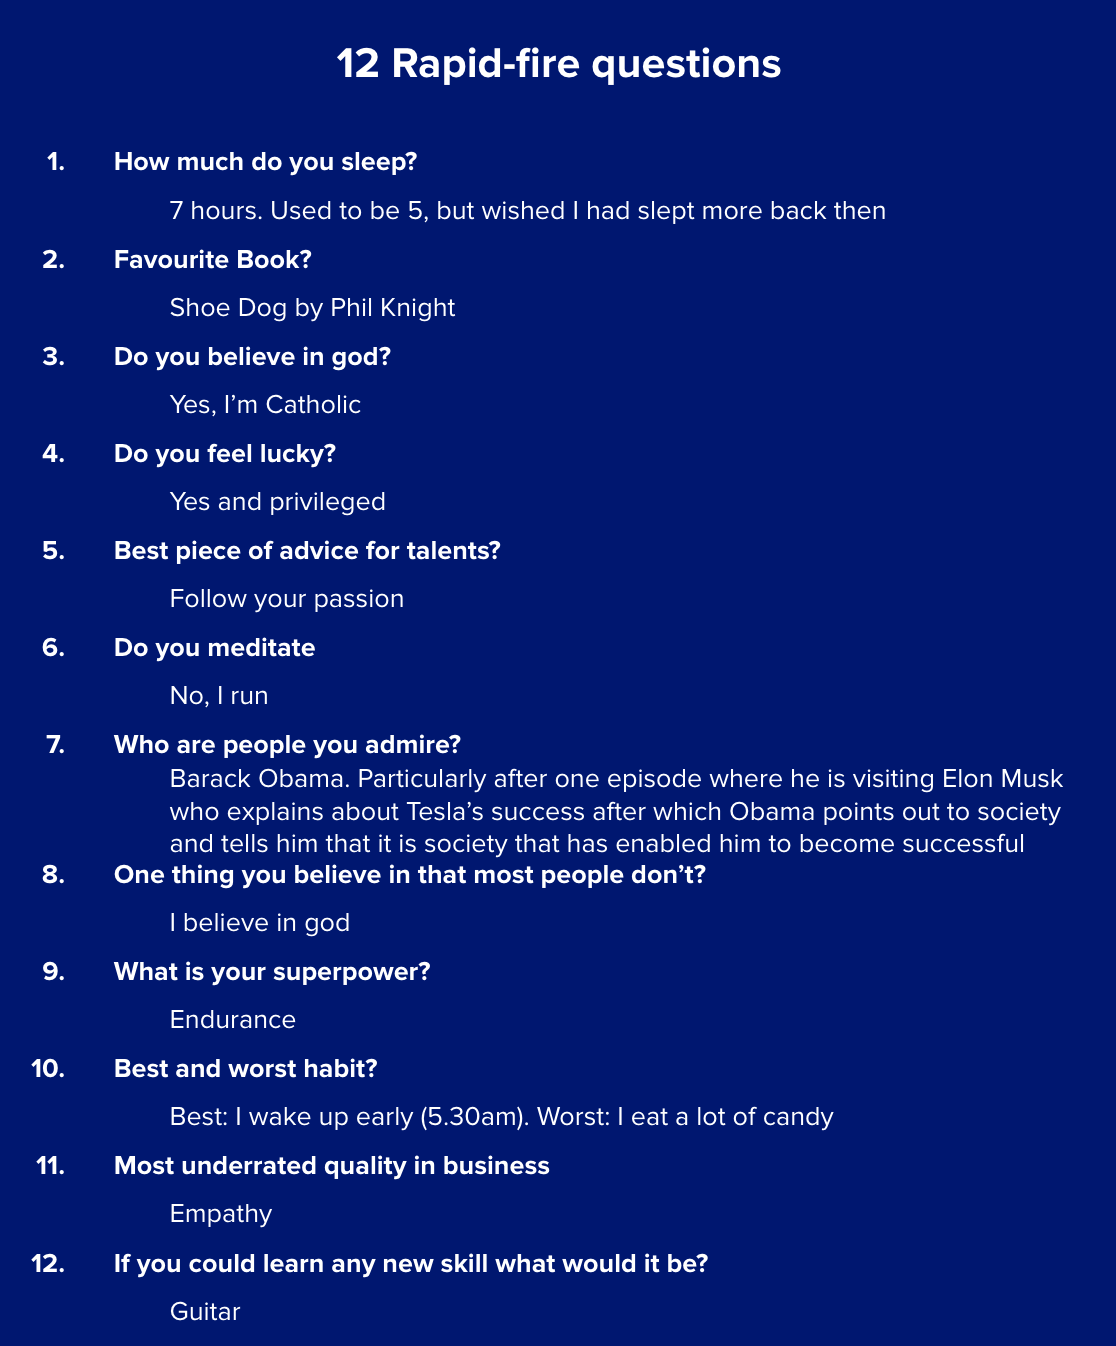 12 rapid fire questions Tue Mantoni